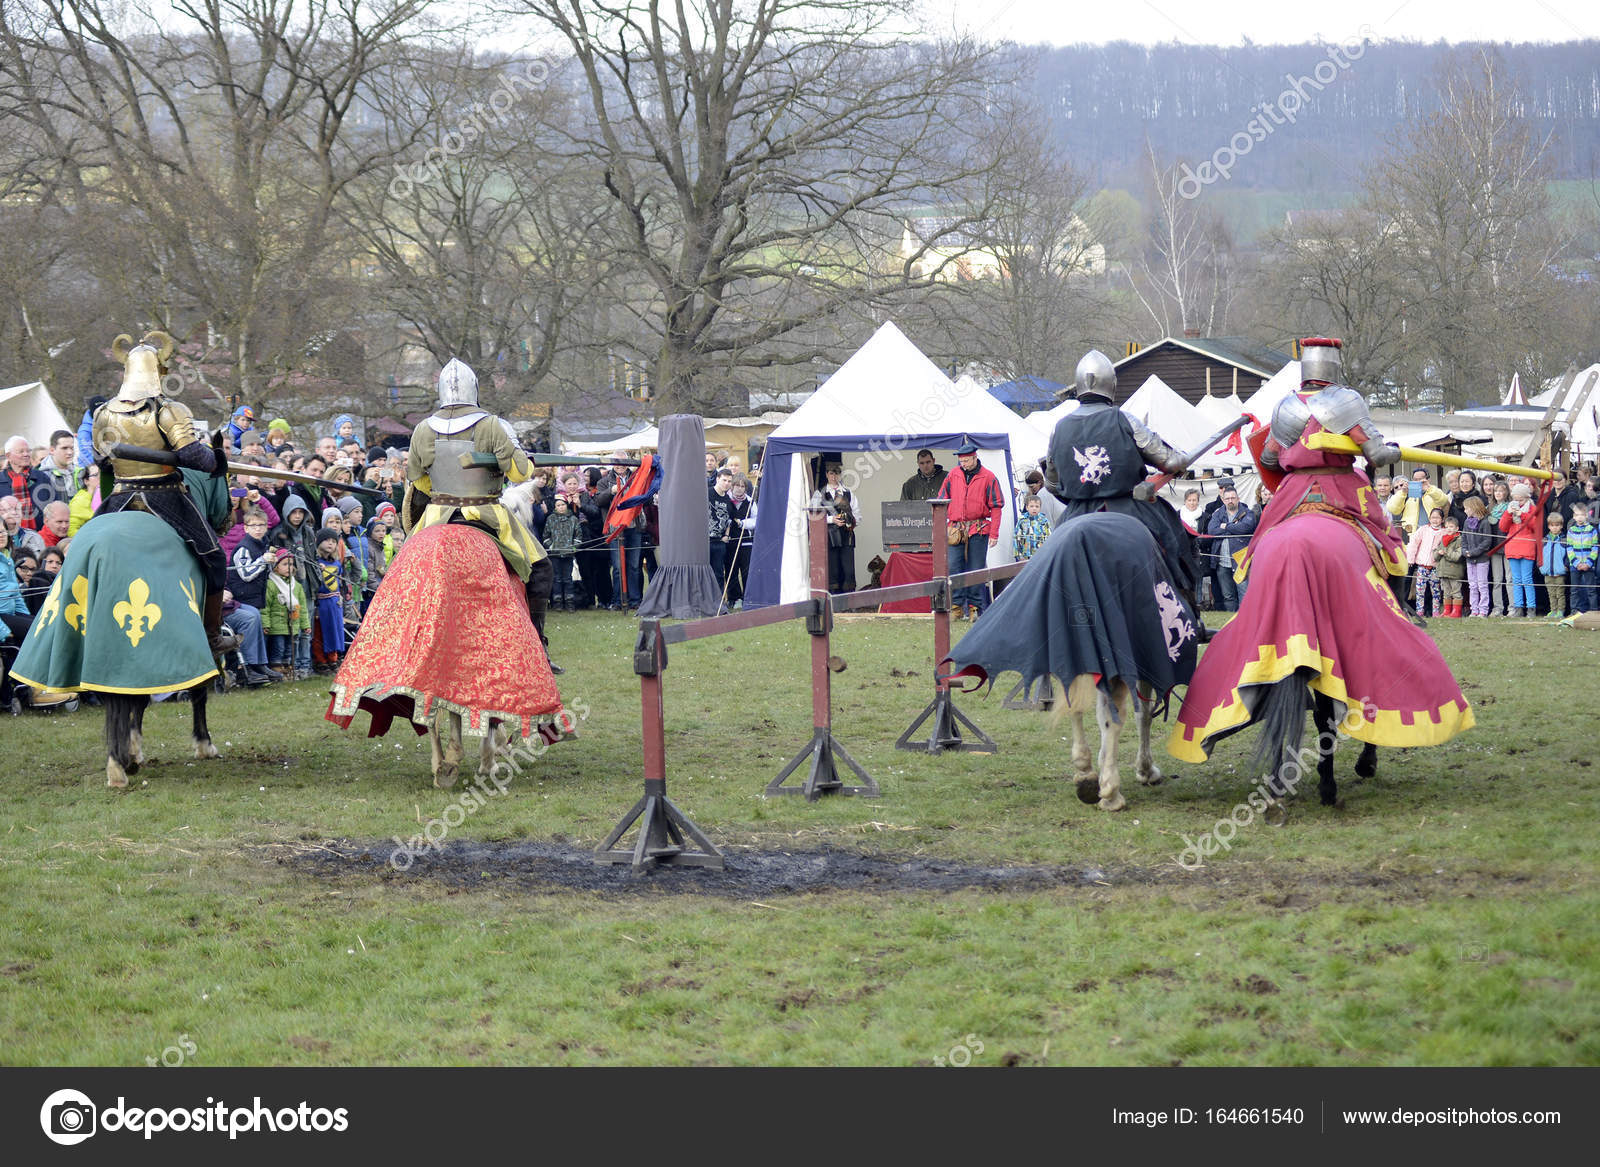 06.04.2015 Lorelay ドイツ , 中世の騎士ゲームの騎士の馬に乗っ